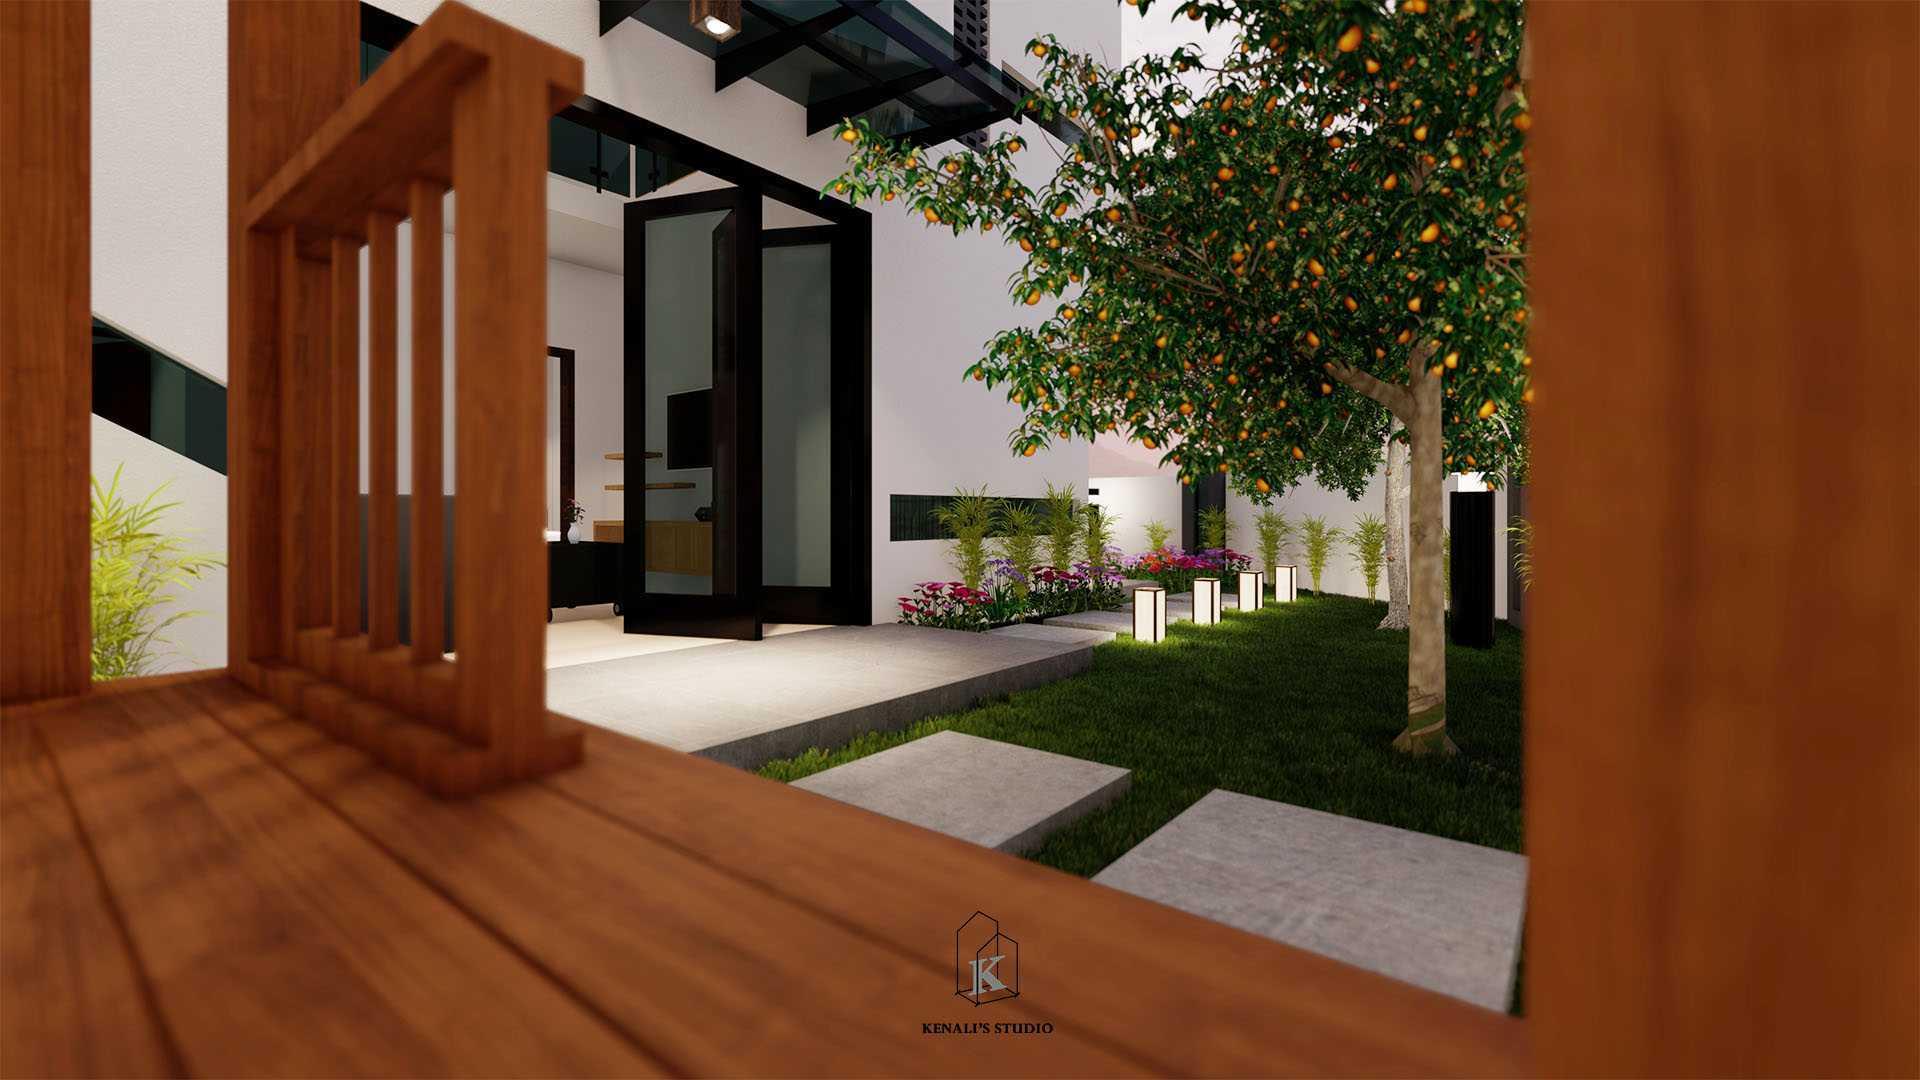 Kenali's Studio Yr - House Kec. Serpong, Kota Tangerang Selatan, Banten, Indonesia Kec. Serpong, Kota Tangerang Selatan, Banten, Indonesia Kenalis-Studio-Yr-House Contemporary  93648